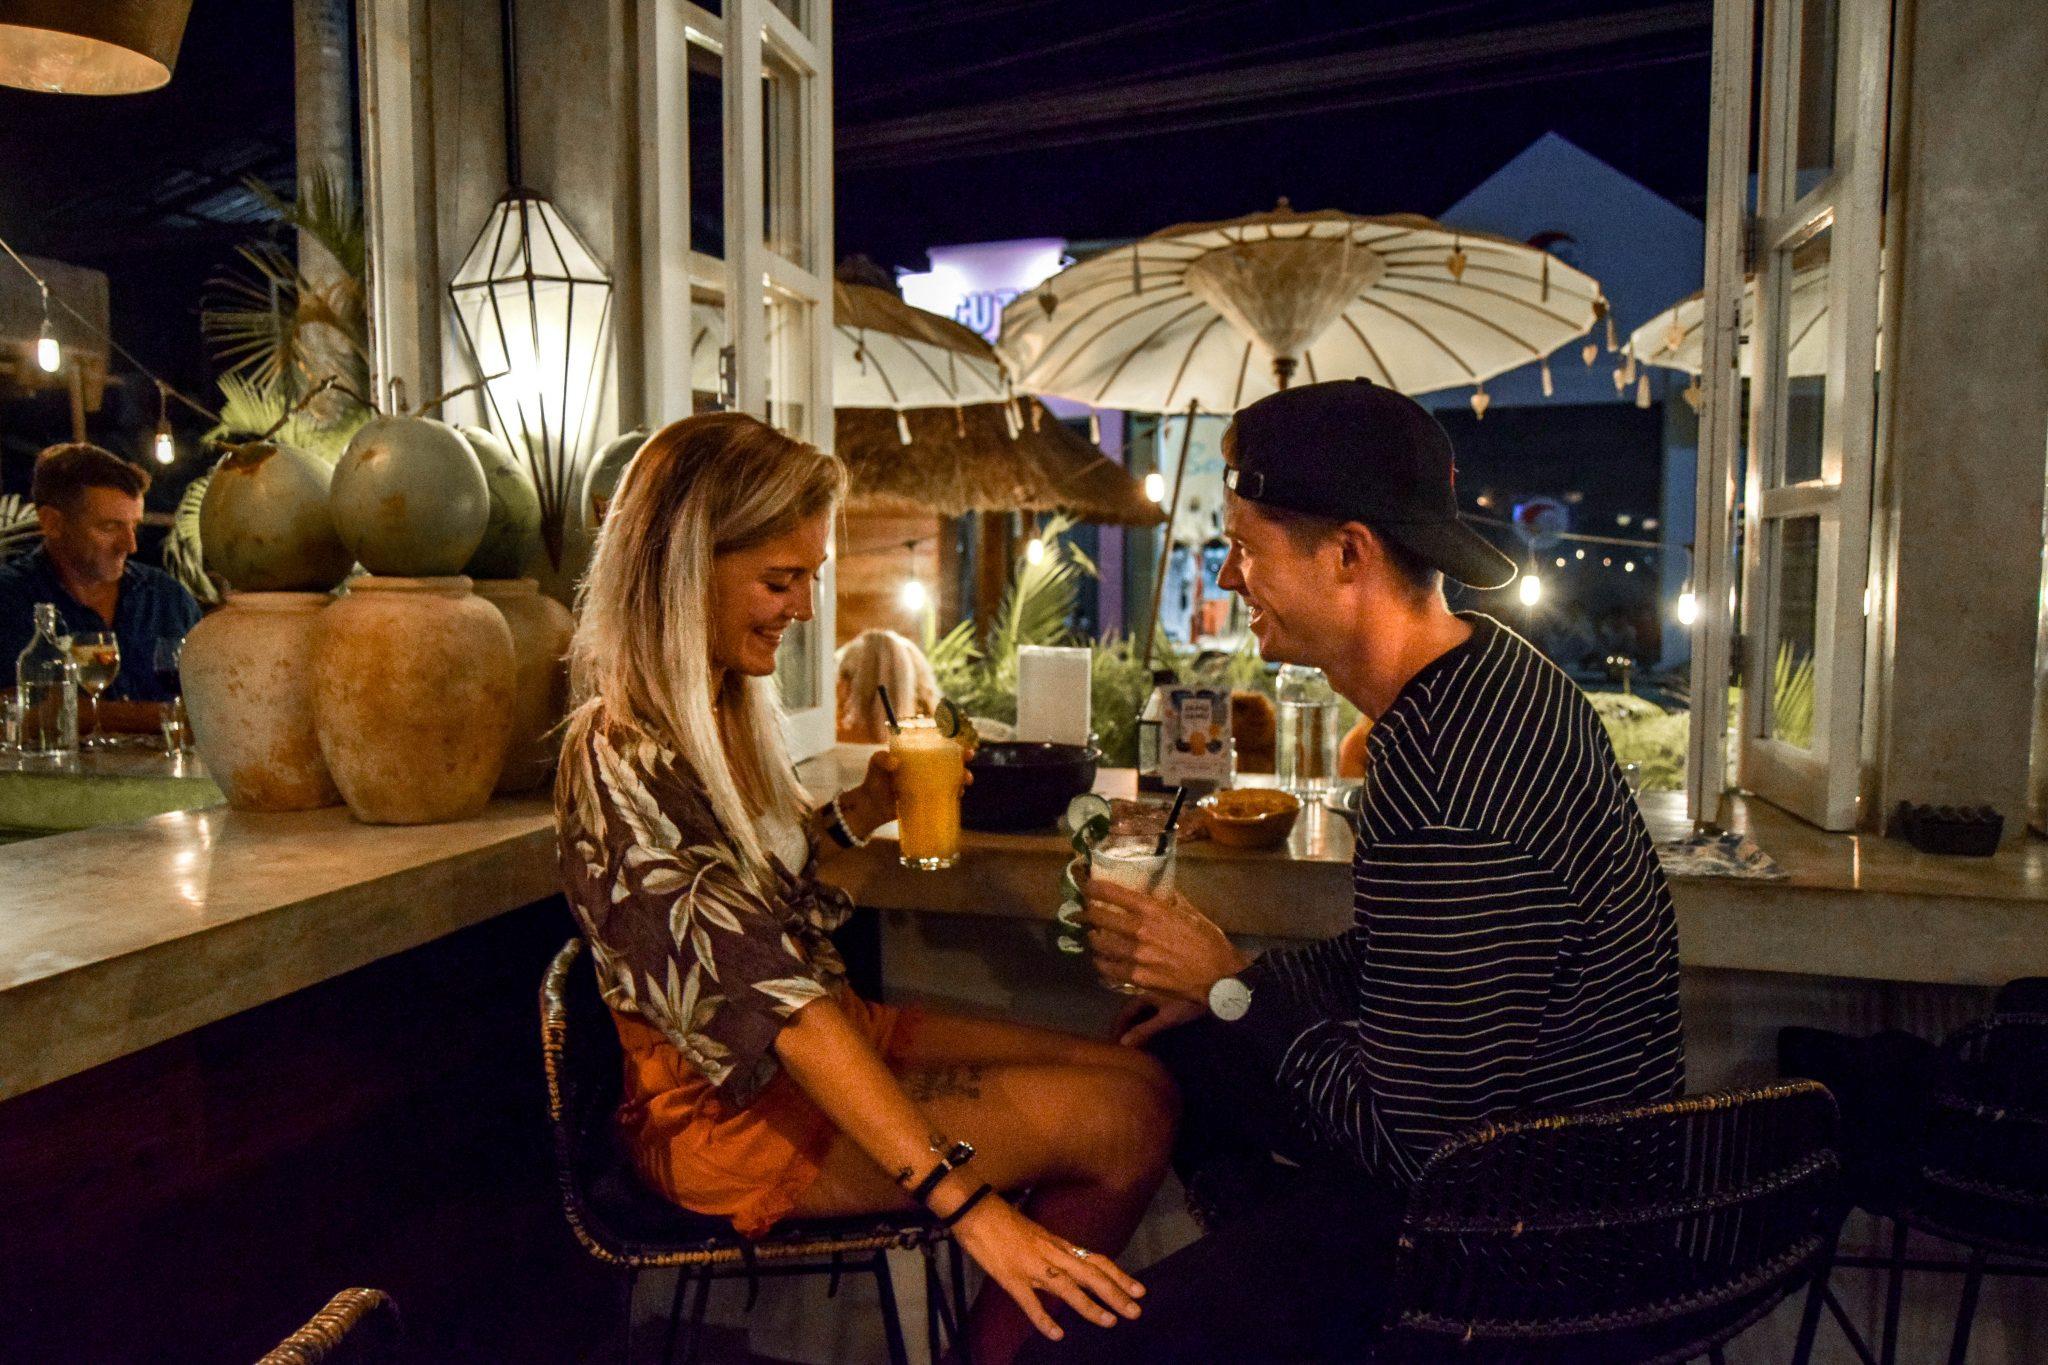 Wanderers & Warriors - Charlie & Lauren UK Travel Couple - Gypsy Kitchen & Bar Canggu Bali - Best Restaurants In Canggu Restaurants